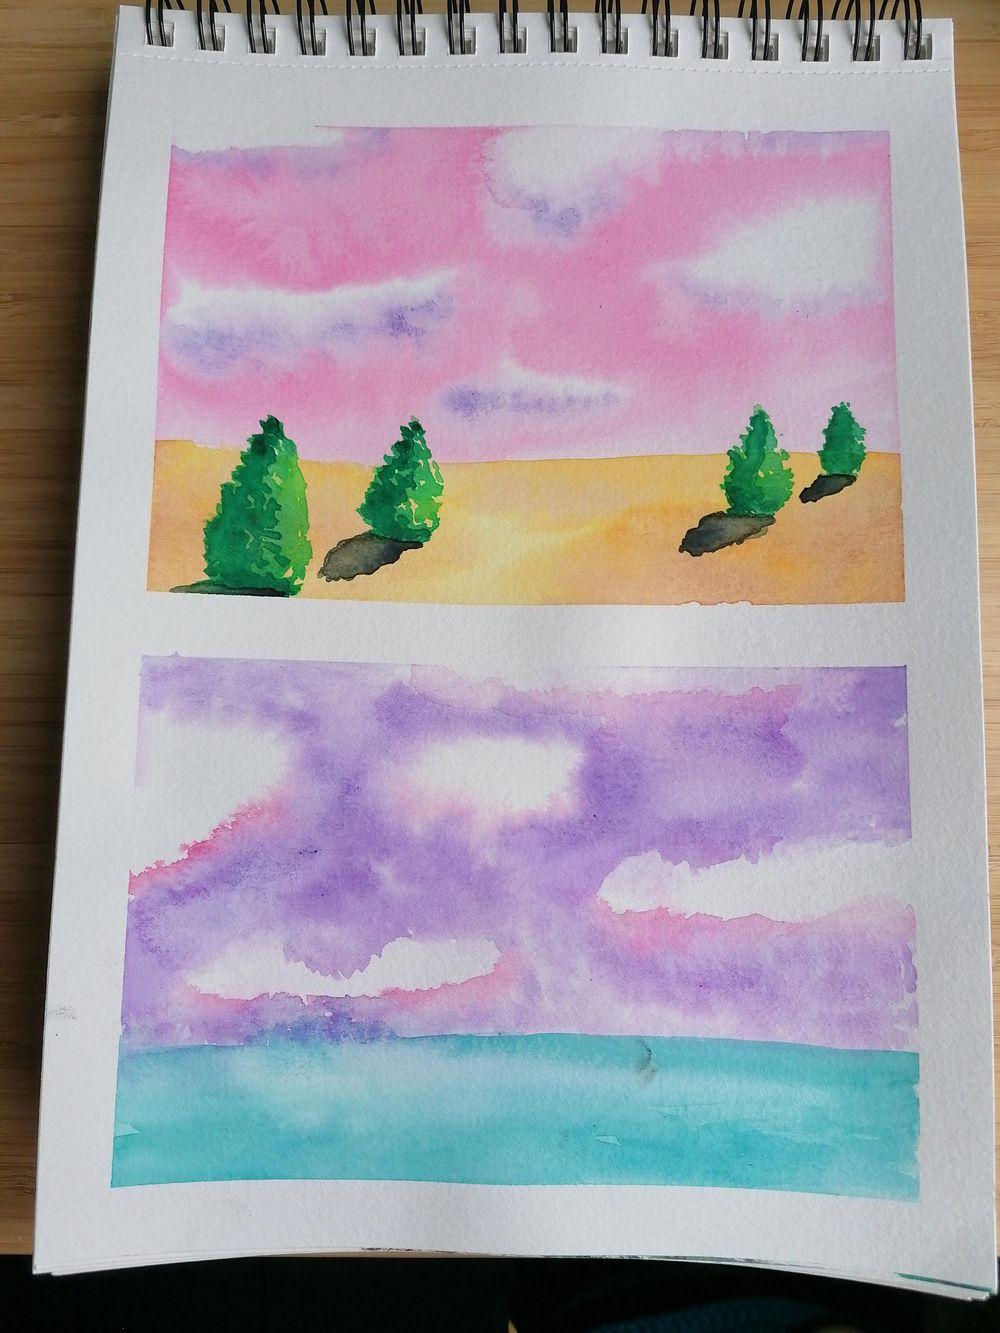 Watercolor landscape - image 3 - student project